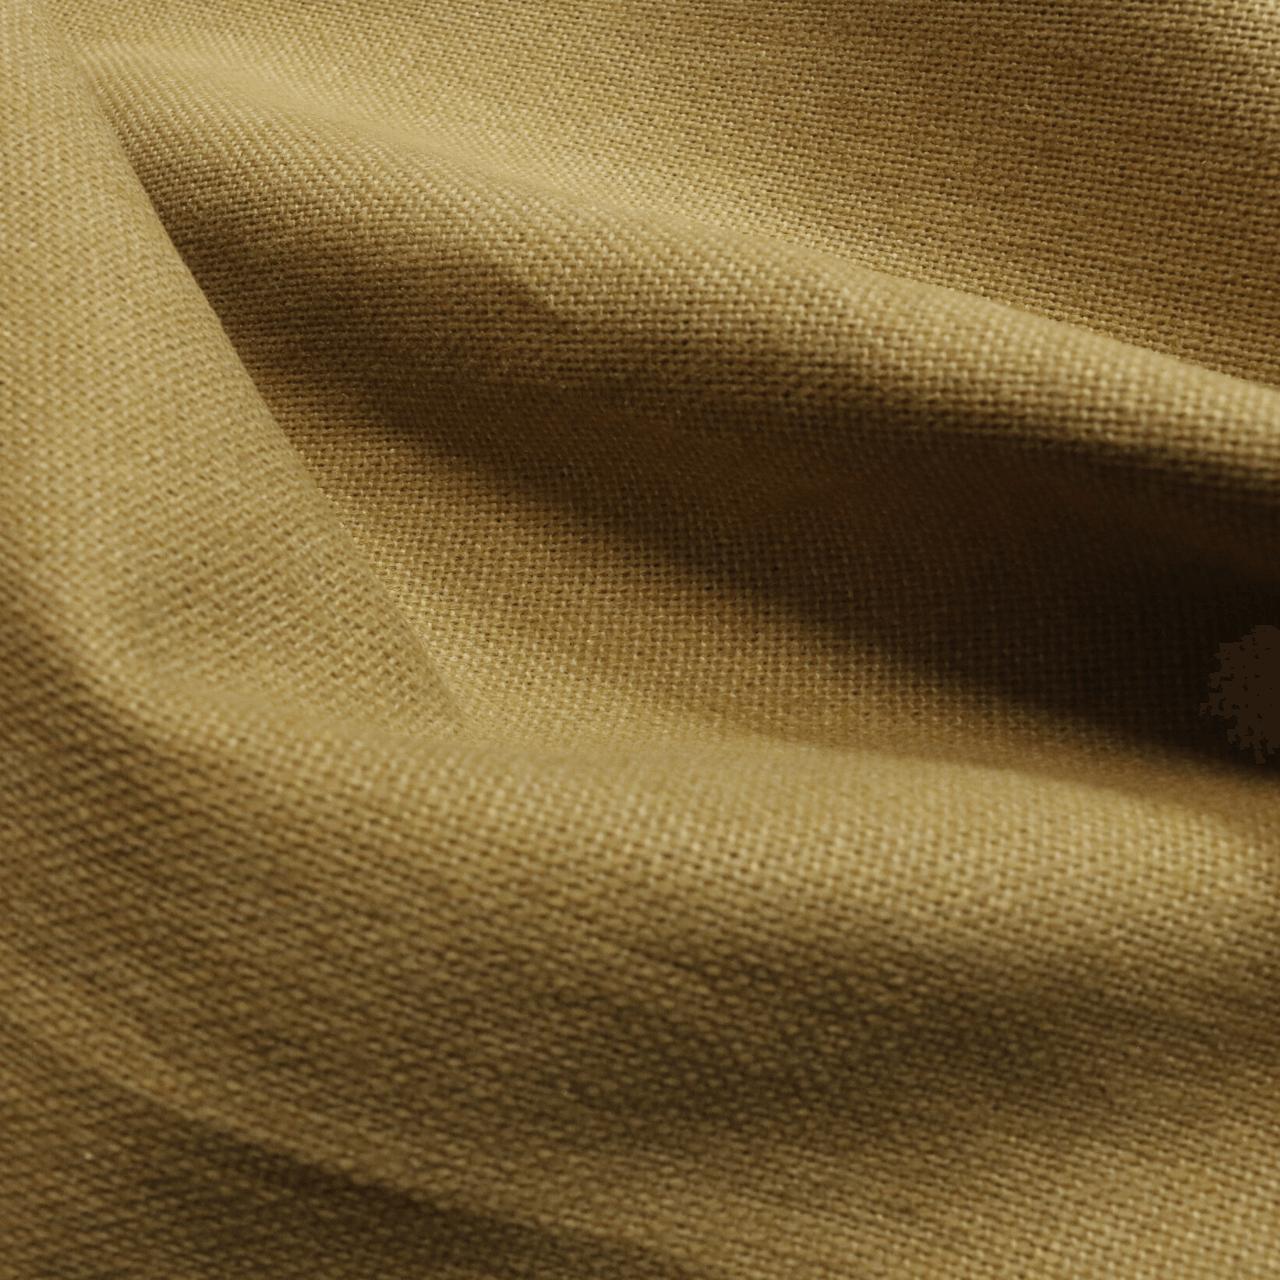 100% Linen - Maple - 140